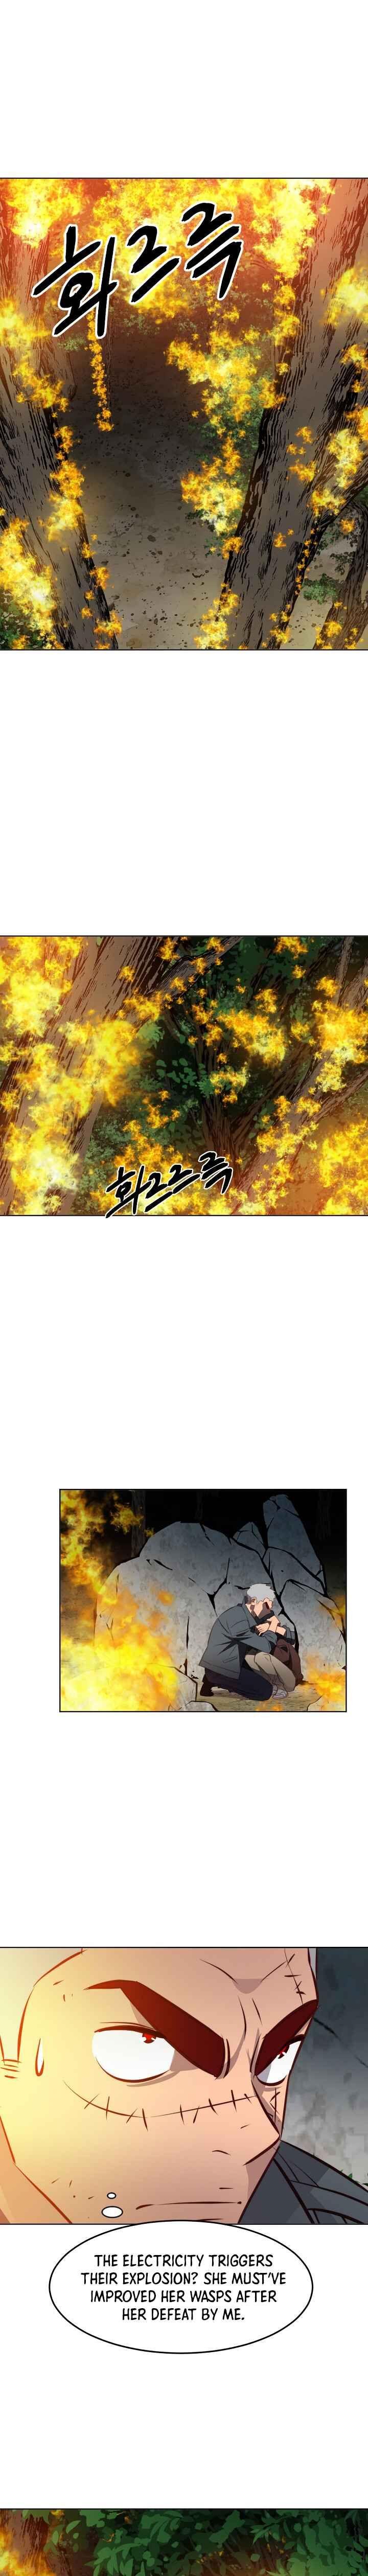 https://img2.nineanime.com/comics/pic4/45/40429/1942869/16ecd261ac5088aee91078bf5225abd9.jpg Page 1